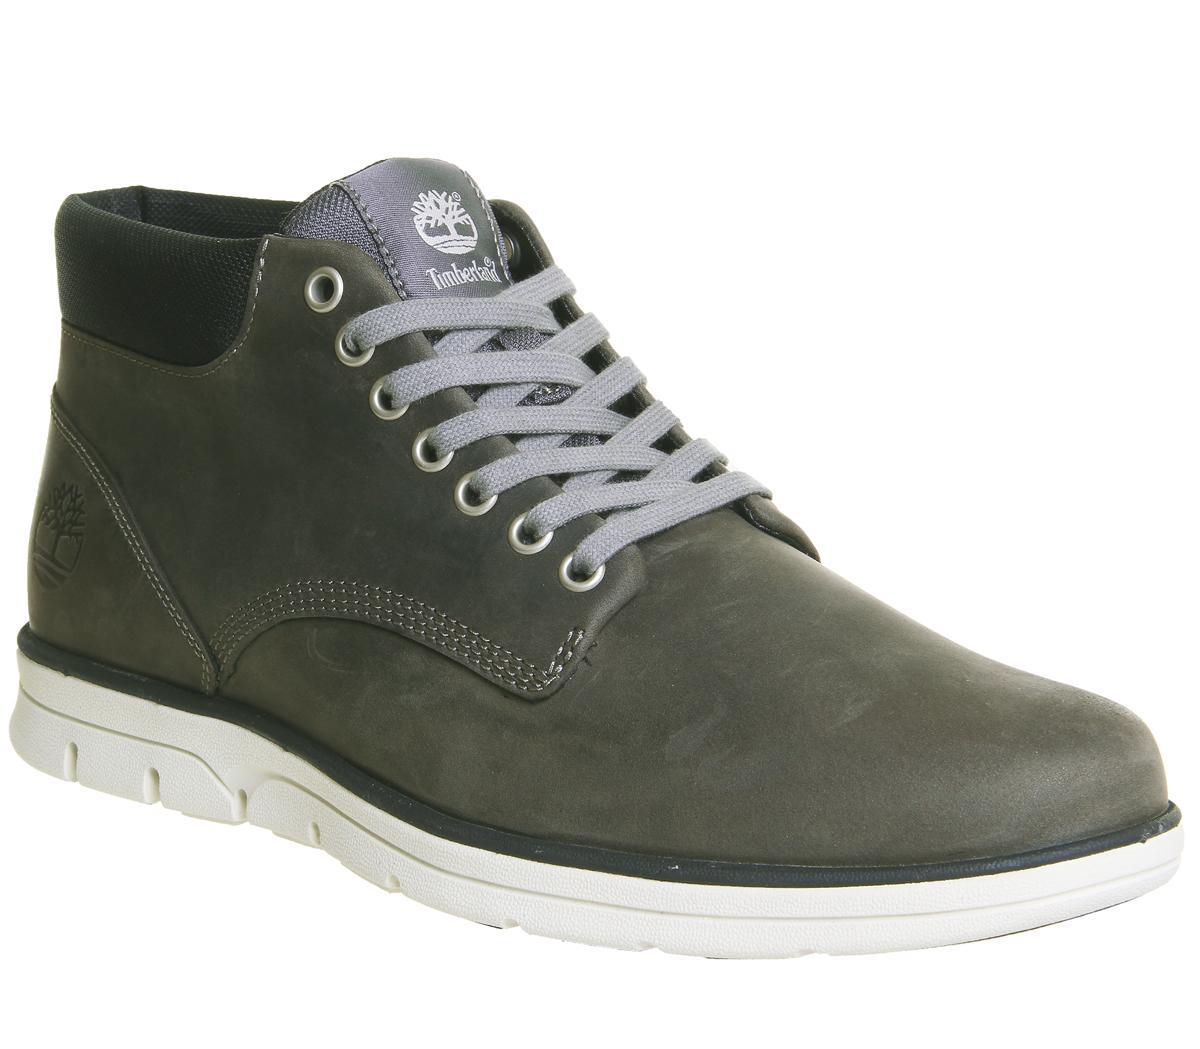 Bradstreet Chukka Boots